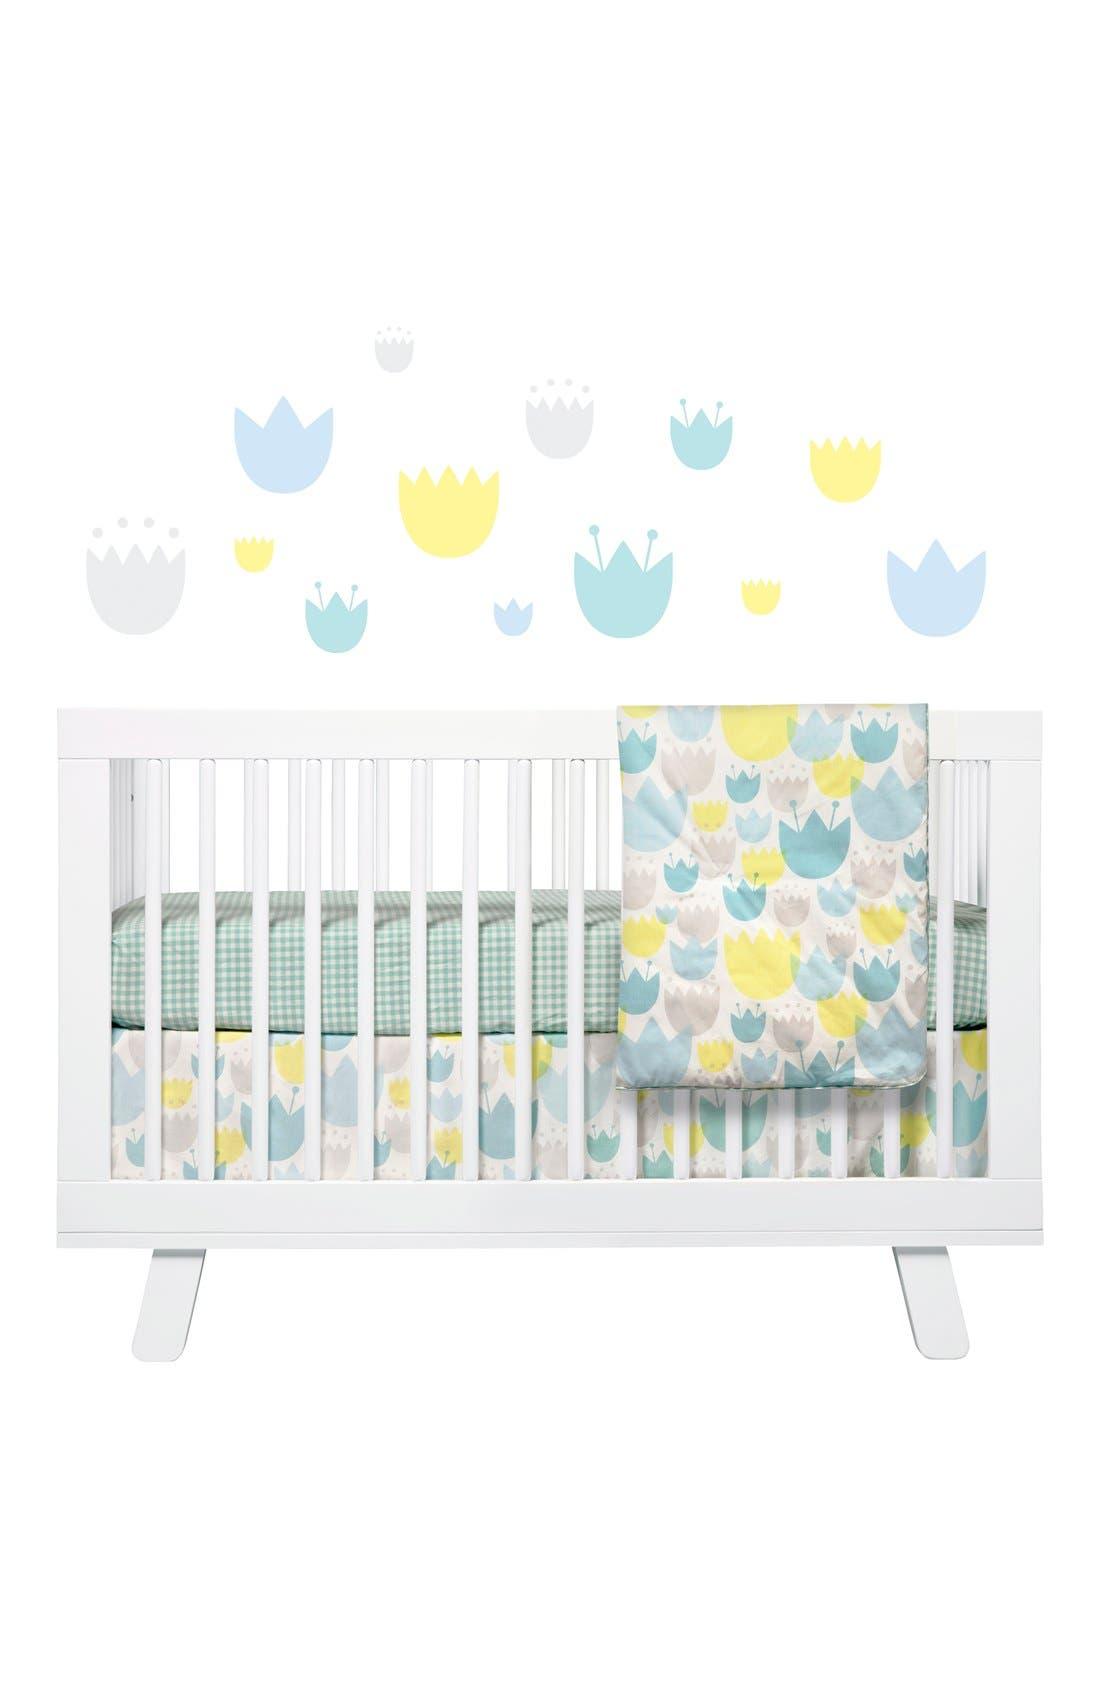 BABYLETTO 'Garden' Crib Sheet, Crib Skirt, Stroller Blanket & Wall Decals, Main, color, 400